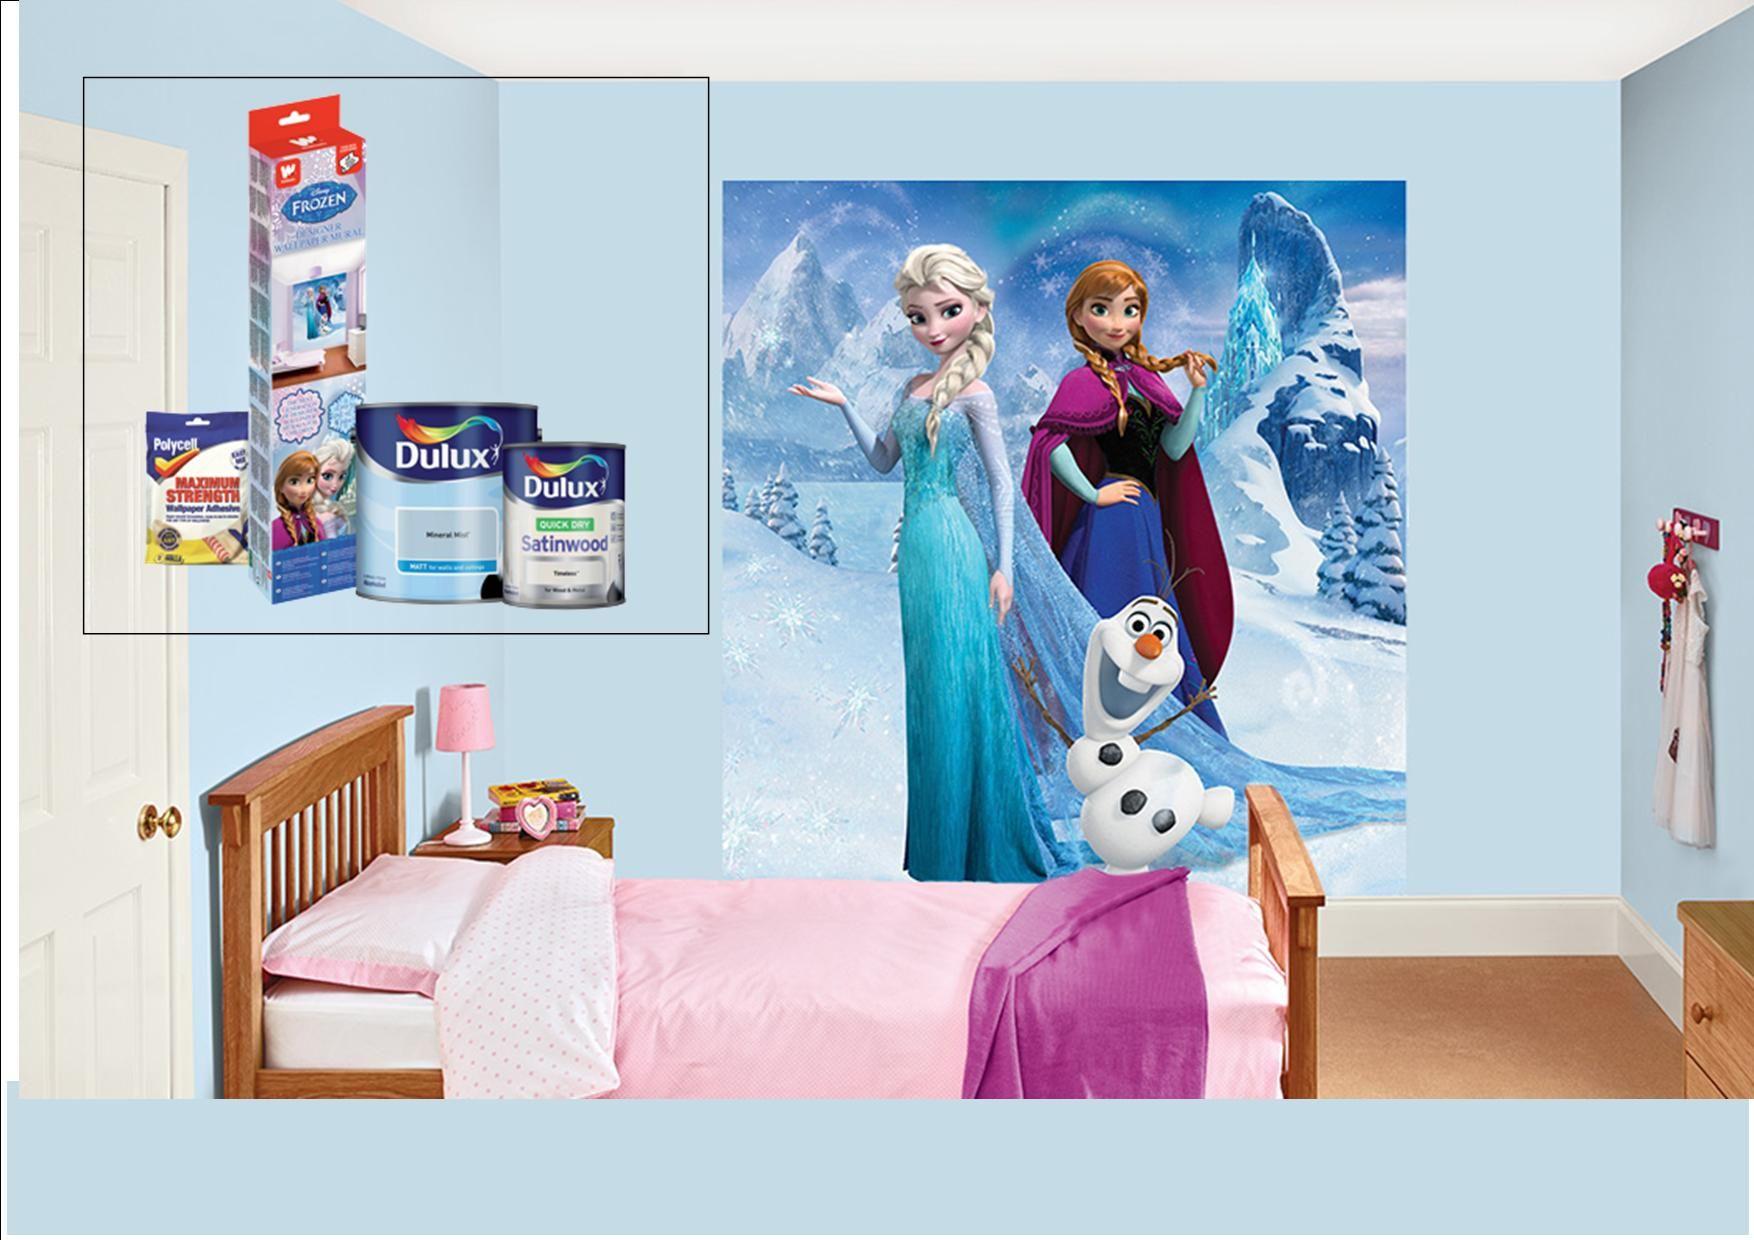 disney frozen bedroom in a box | design ideas 2017-2018 ...